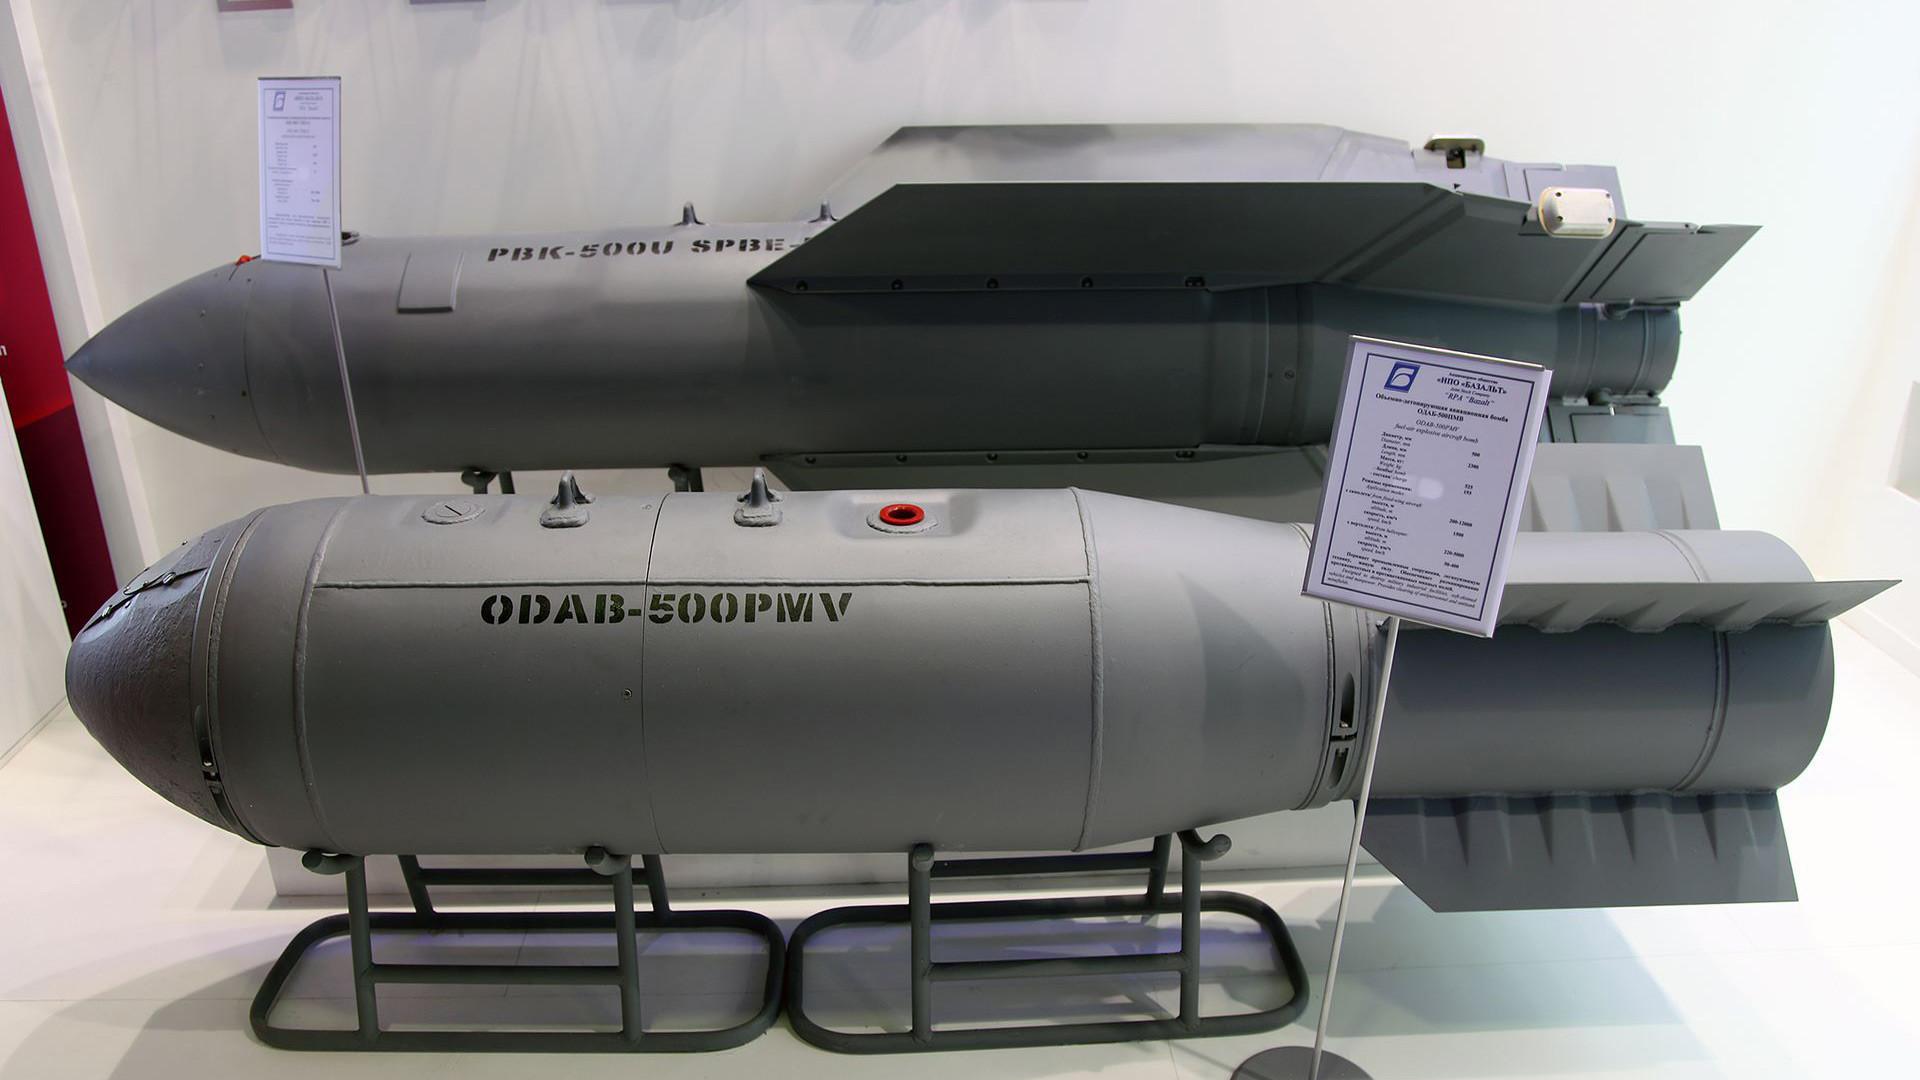 Касетна бомба ПБК-500У СПБЭ-К и термобарична авионска бомба ОДАБ-500ПМВ.